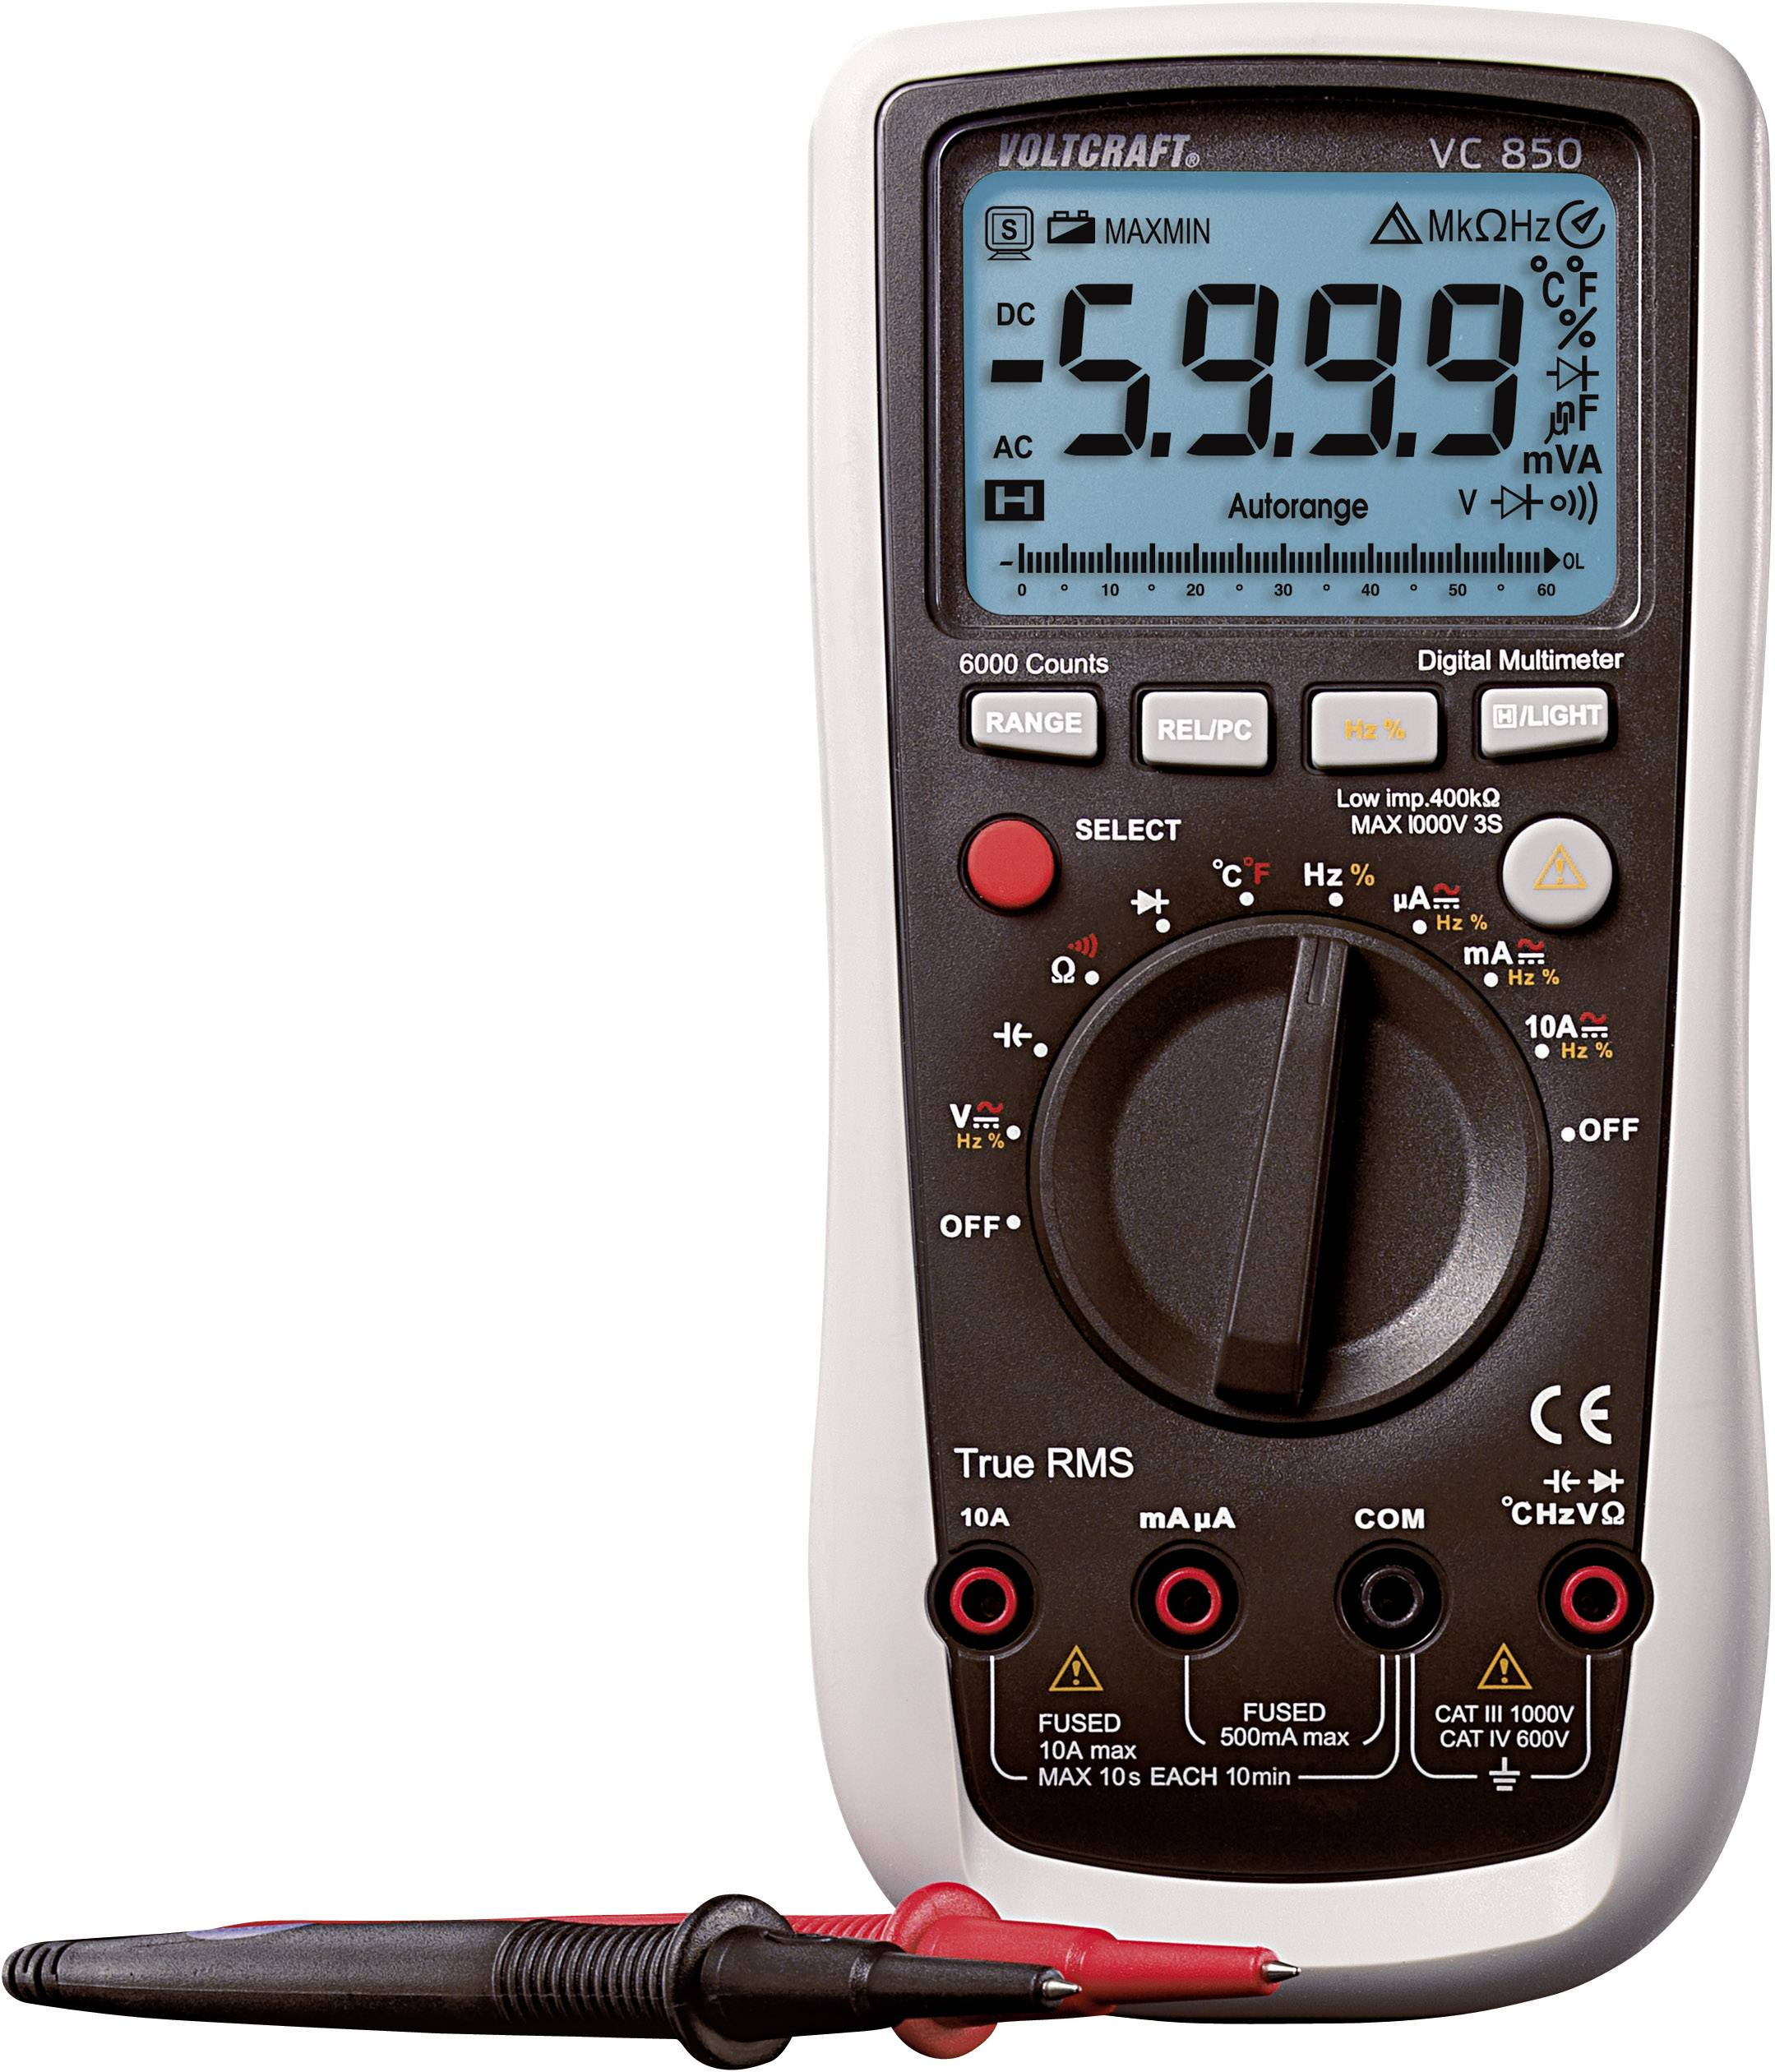 Handheld multimeter Digital VOLTCRAFT VC850 CAT III 1000 V